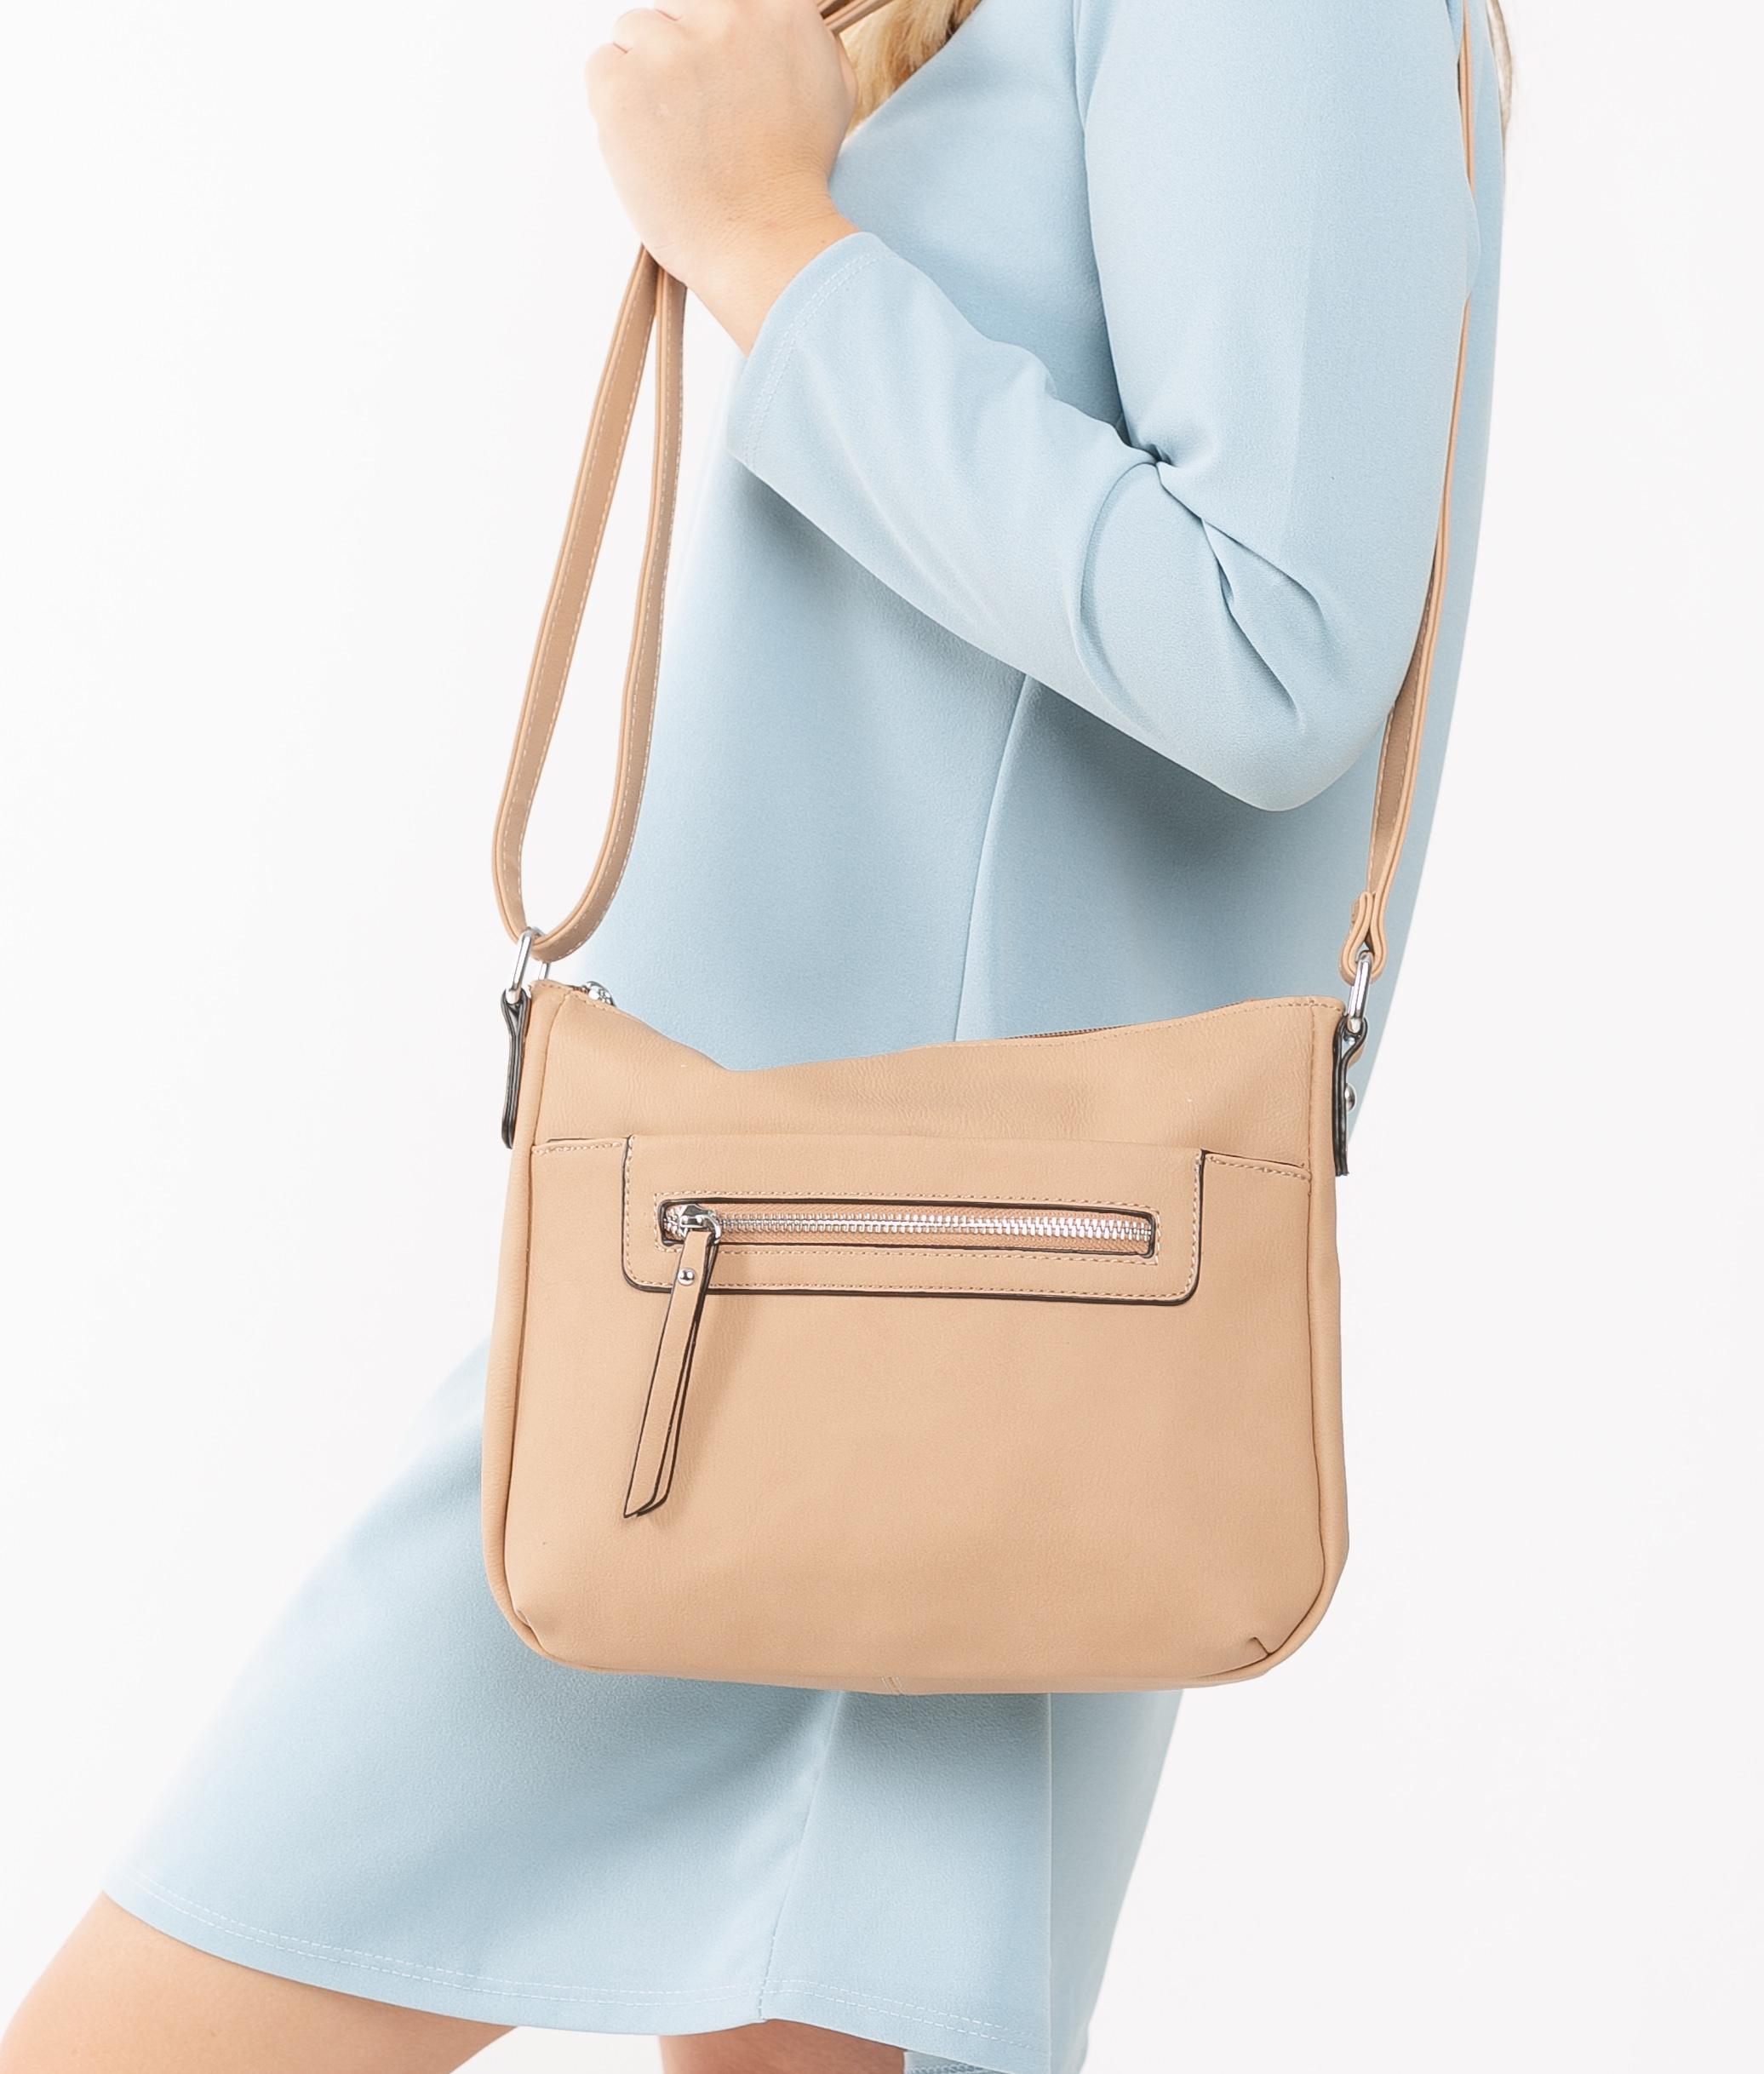 Shoulder bag Lisy - Kaki